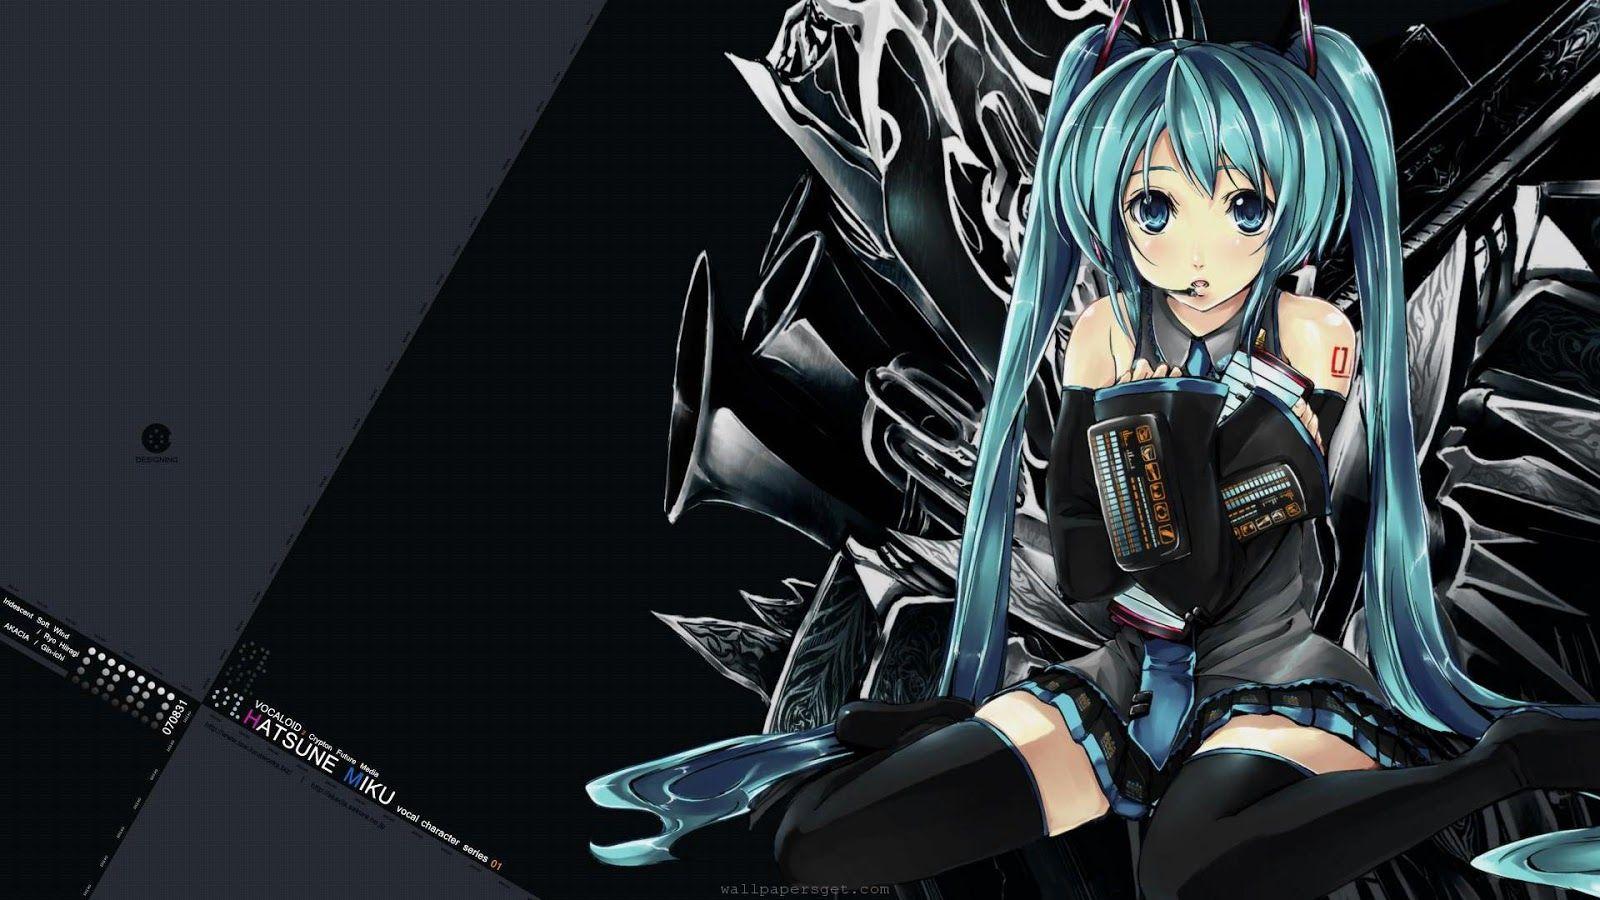 Anime+wallpaper perfect hd anime wallpapers Hd anime